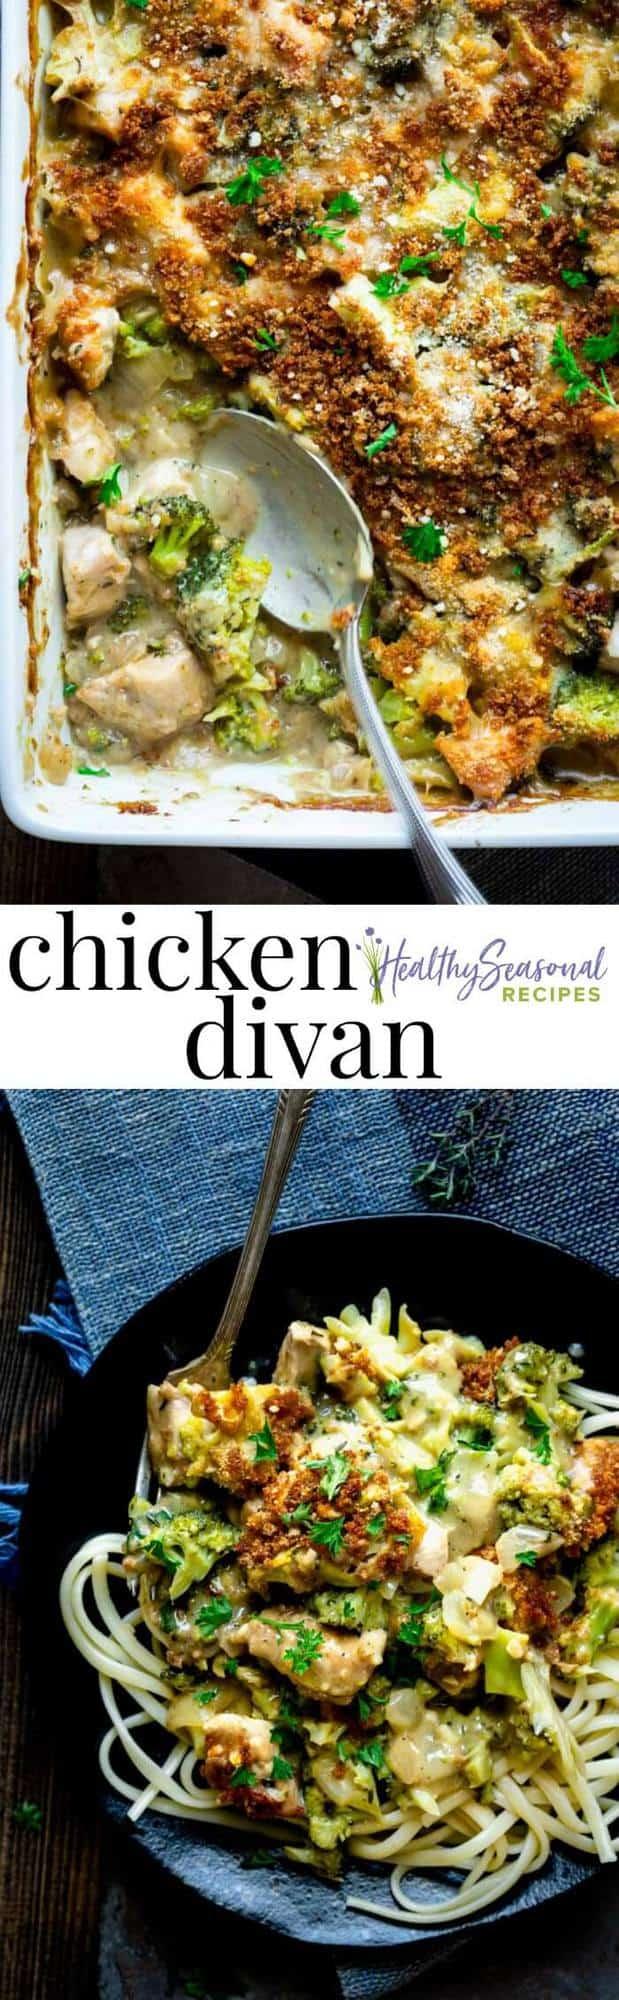 healthy chicken divan